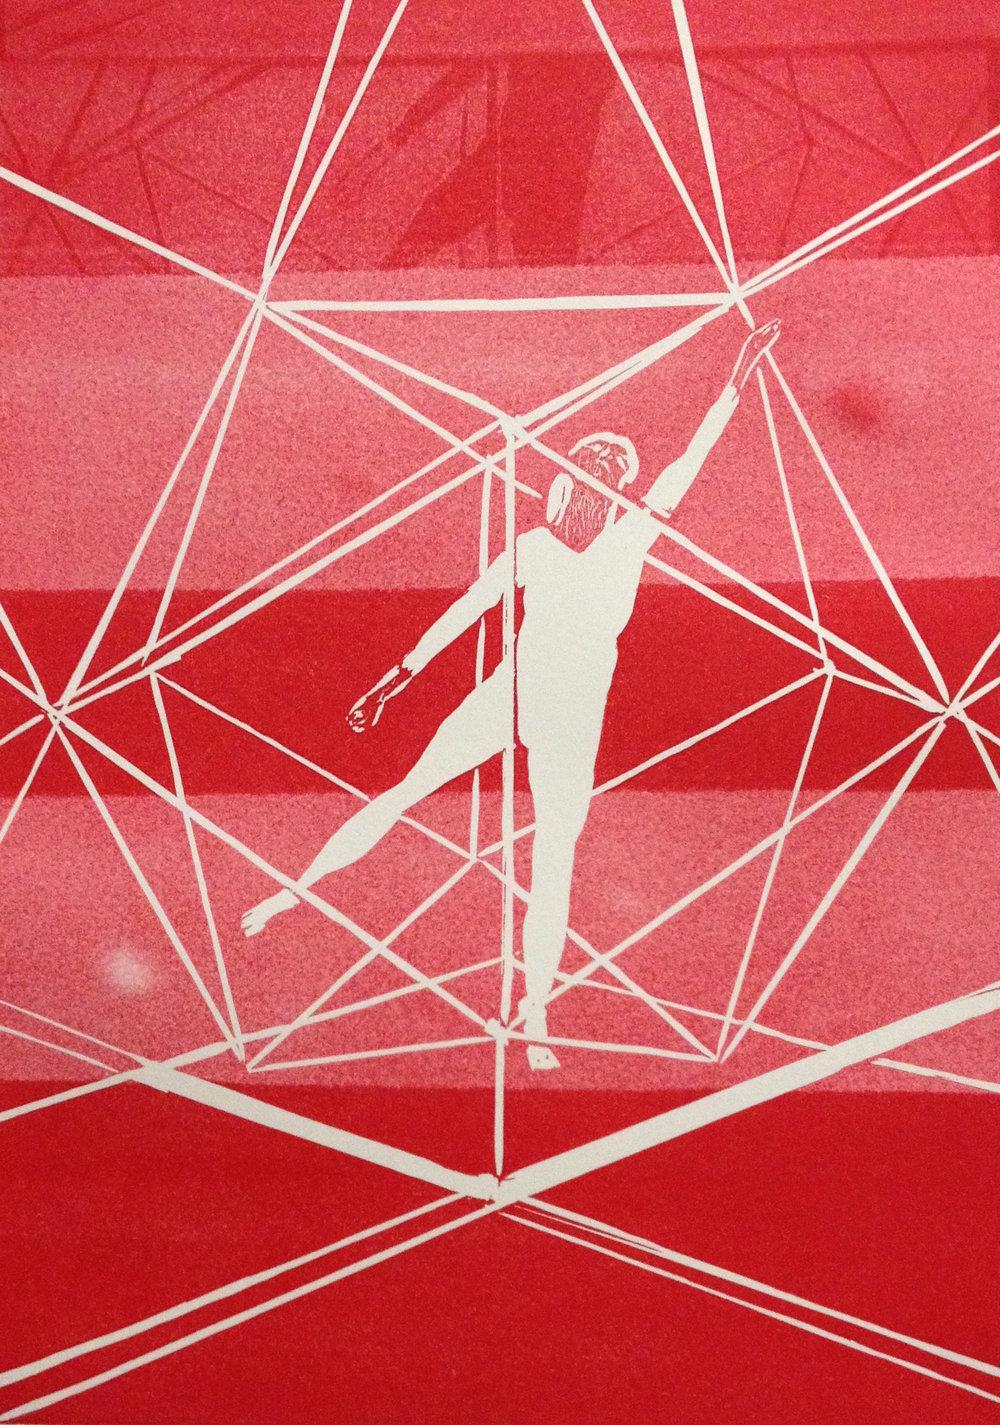 Dance-engraving-charliecth